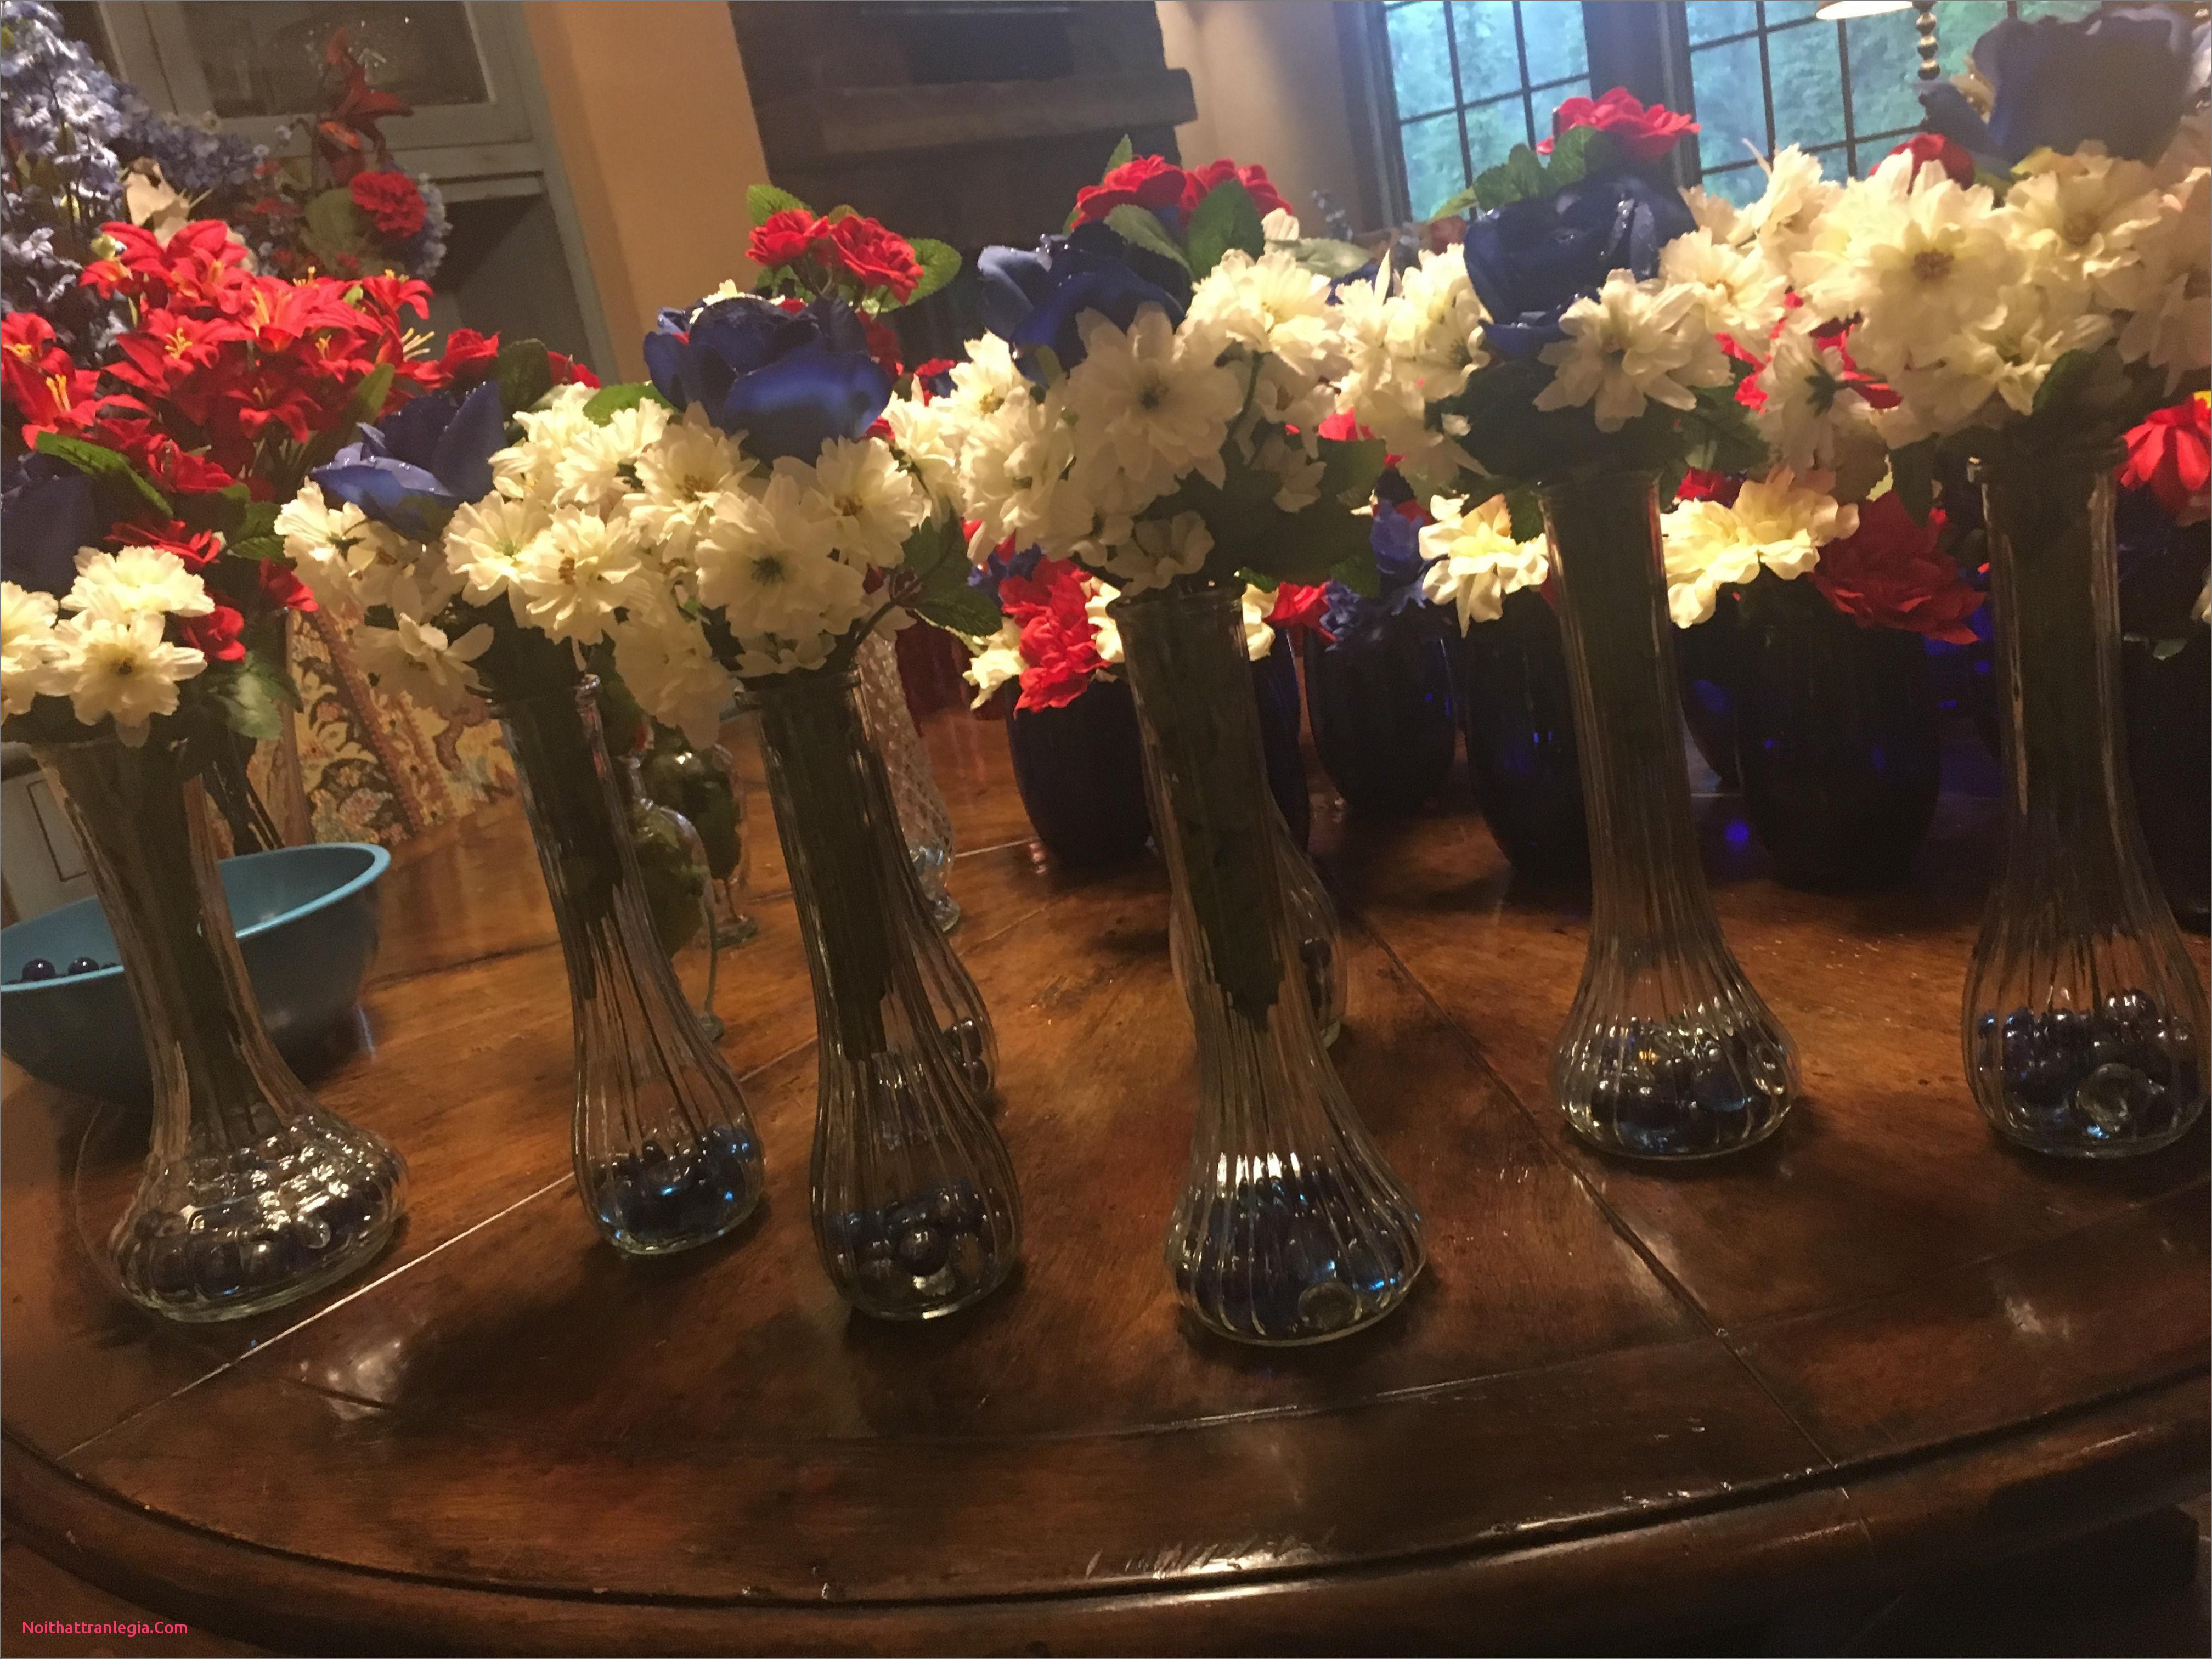 flower arrangements in vases images of 20 how to clean flower vases noithattranlegia vases design in diy wedding decoration ideas inspirational dollar tree wedding decorations awesome h vases dollar vase i 0d